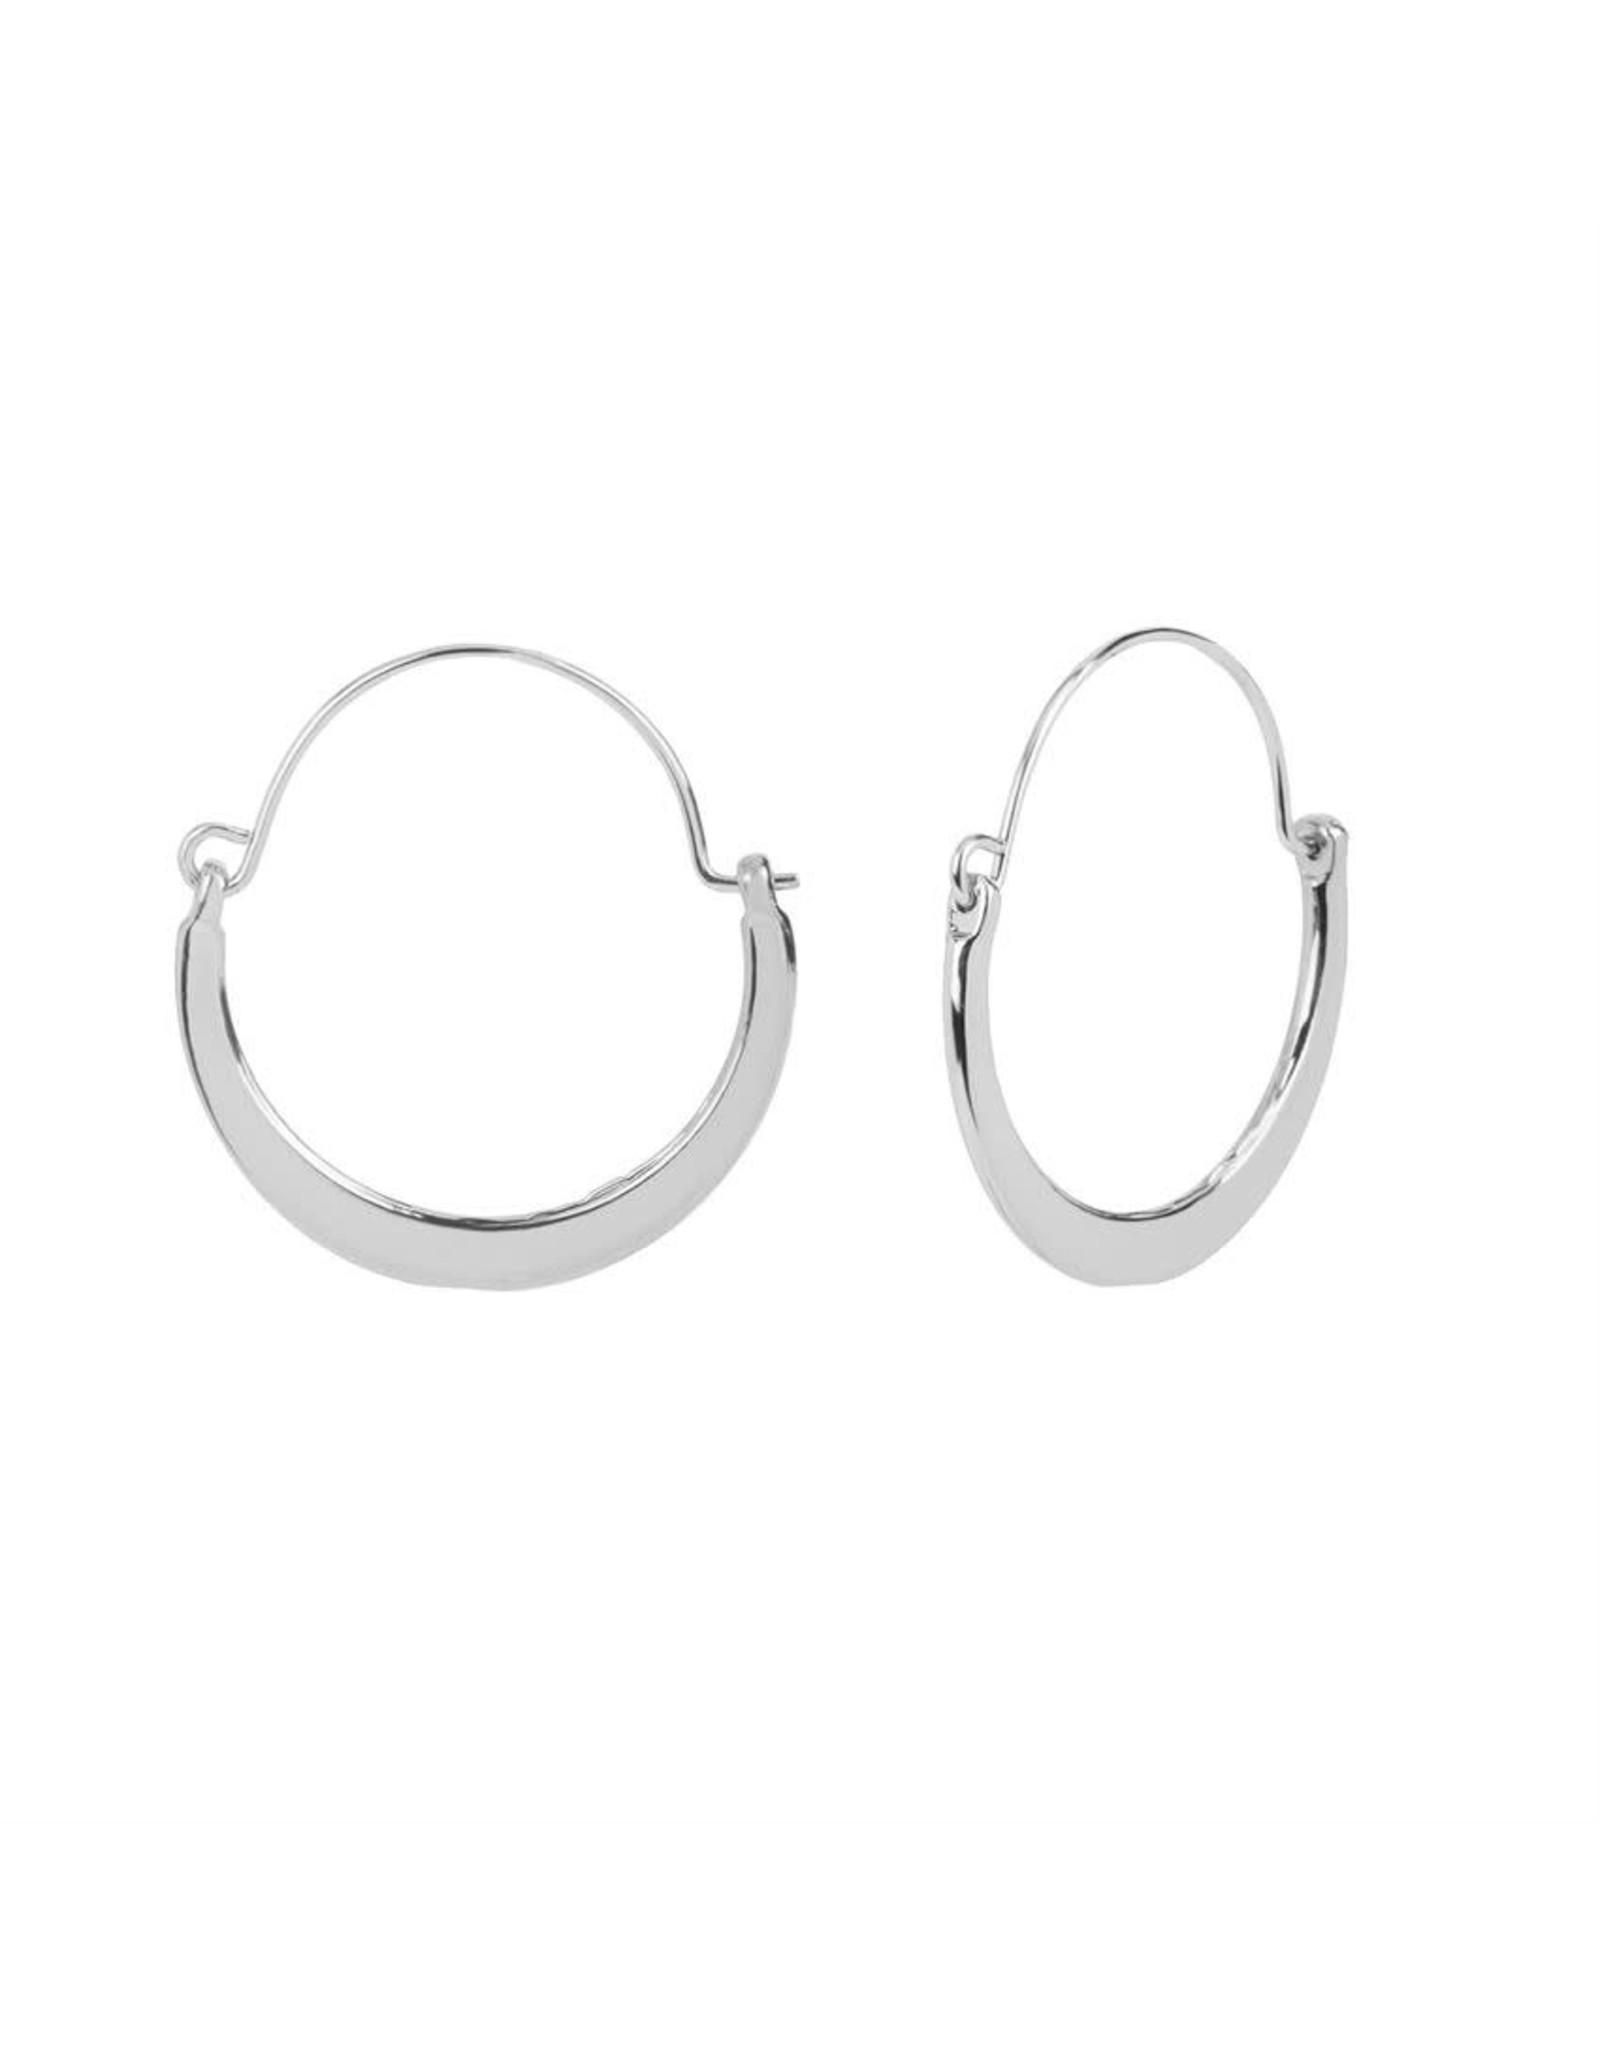 TGB / Good Bead FLAT CRESCENT HOOP EARRINGS